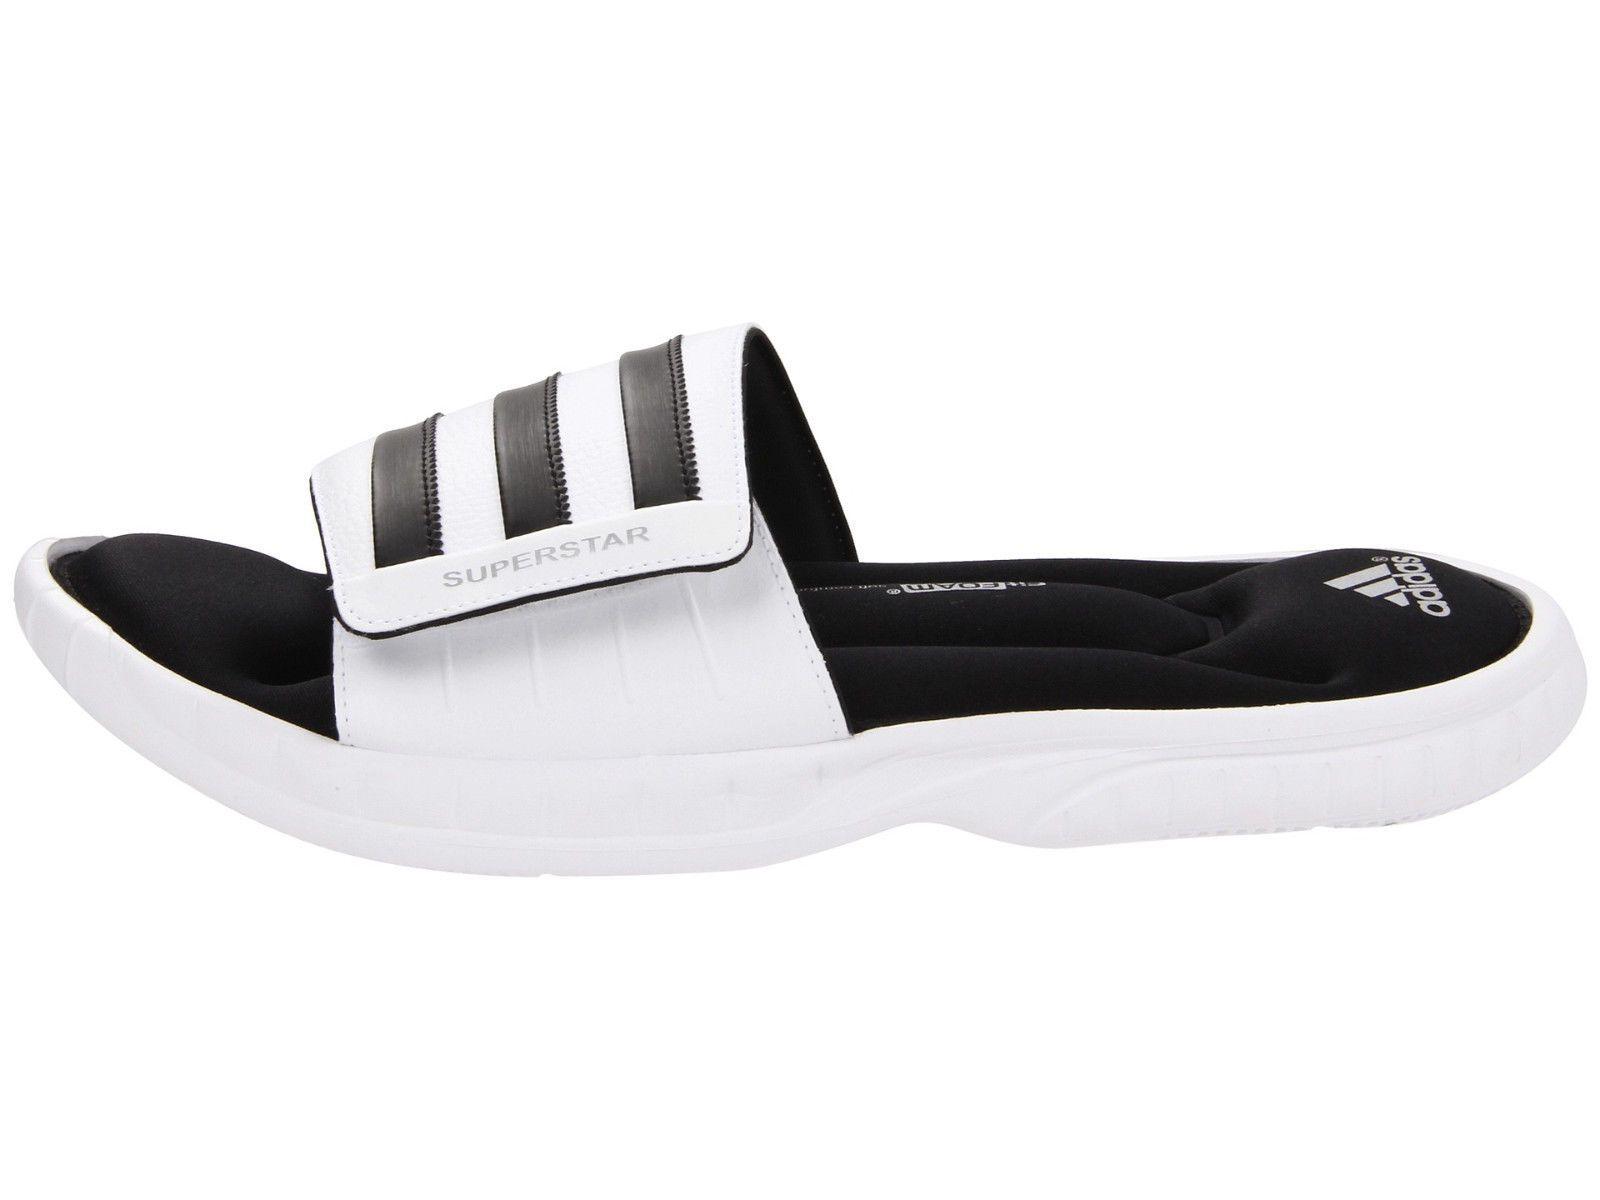 Mens Adidas Superstar 3G White Slides Athletic Sport Sandals G61951 Sizes  10-13  34.99 End 91c667f15